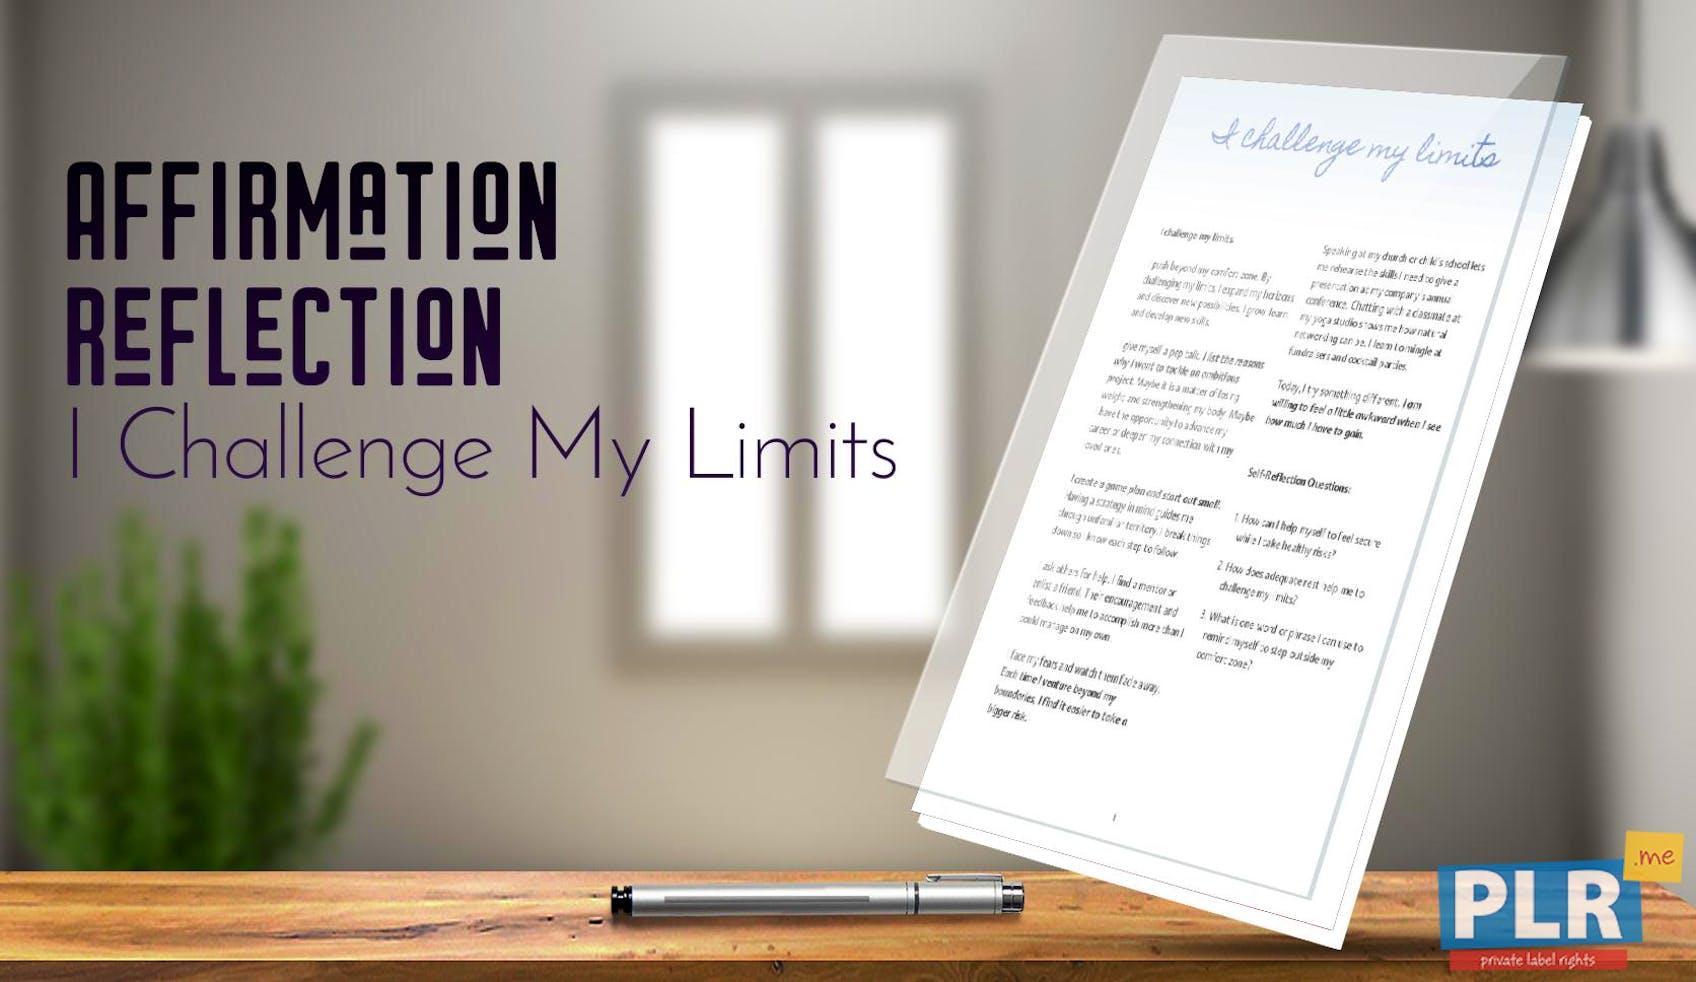 I Challenge My Limits